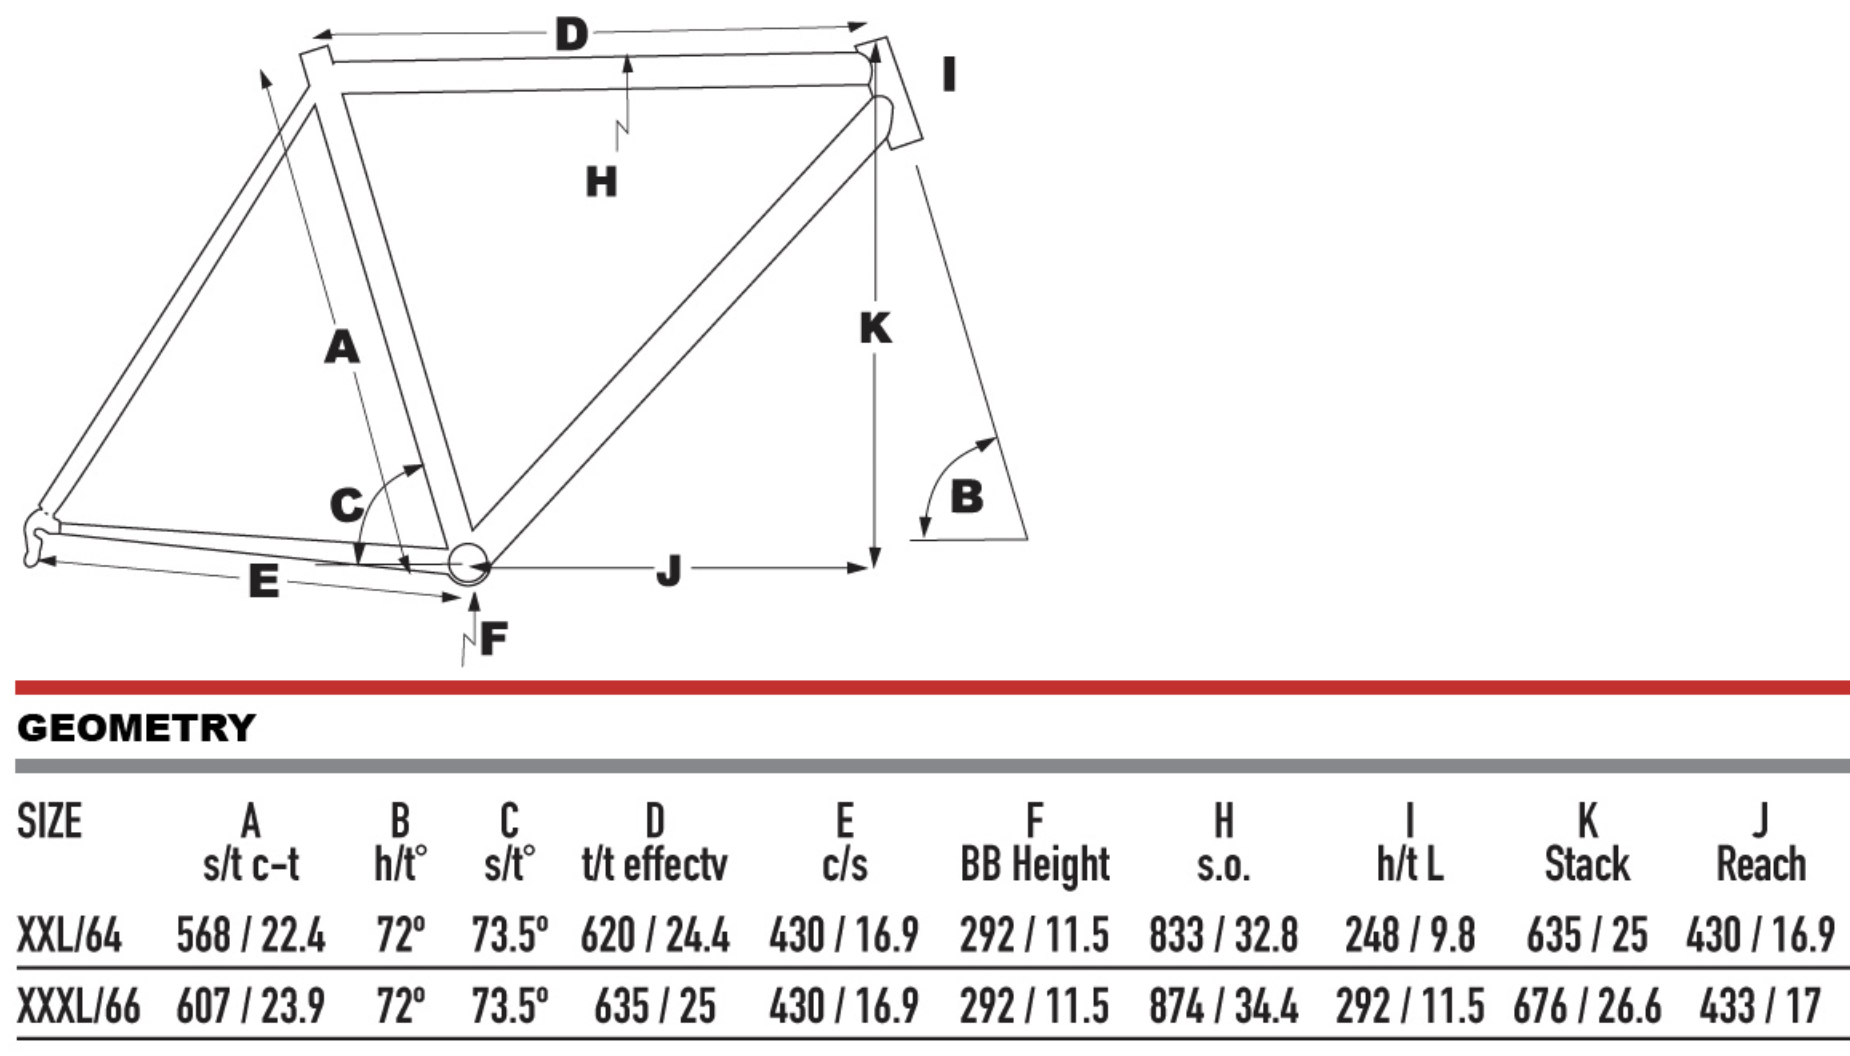 KHS Flite 747 geometry chart